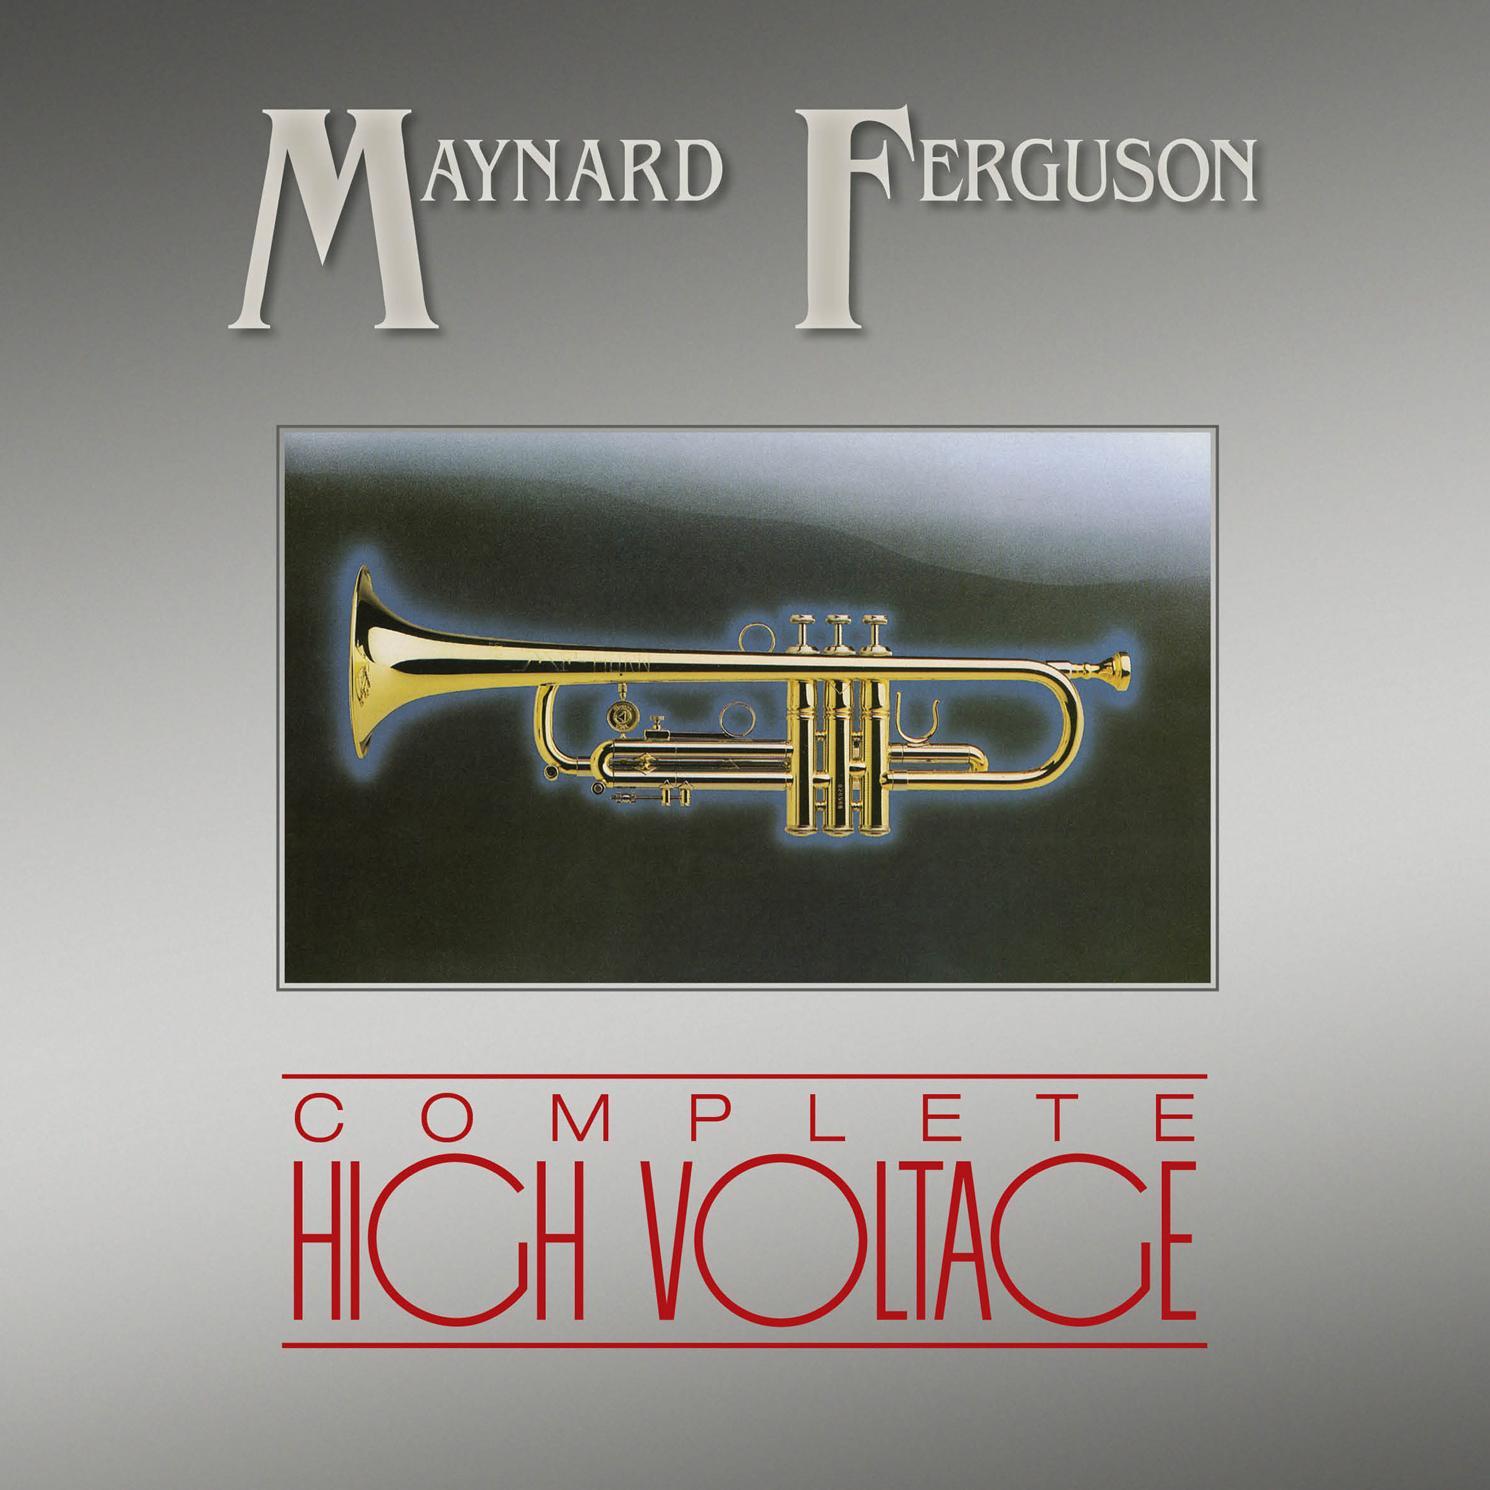 Maynard Ferguson-Complete High Voltage  Release Date: July 15, 2016 Label: Omnivore Recordings  SERVICE: Mastering NUMBER OF DISCS: 1 GENRE: Jazz FORMAT: CD